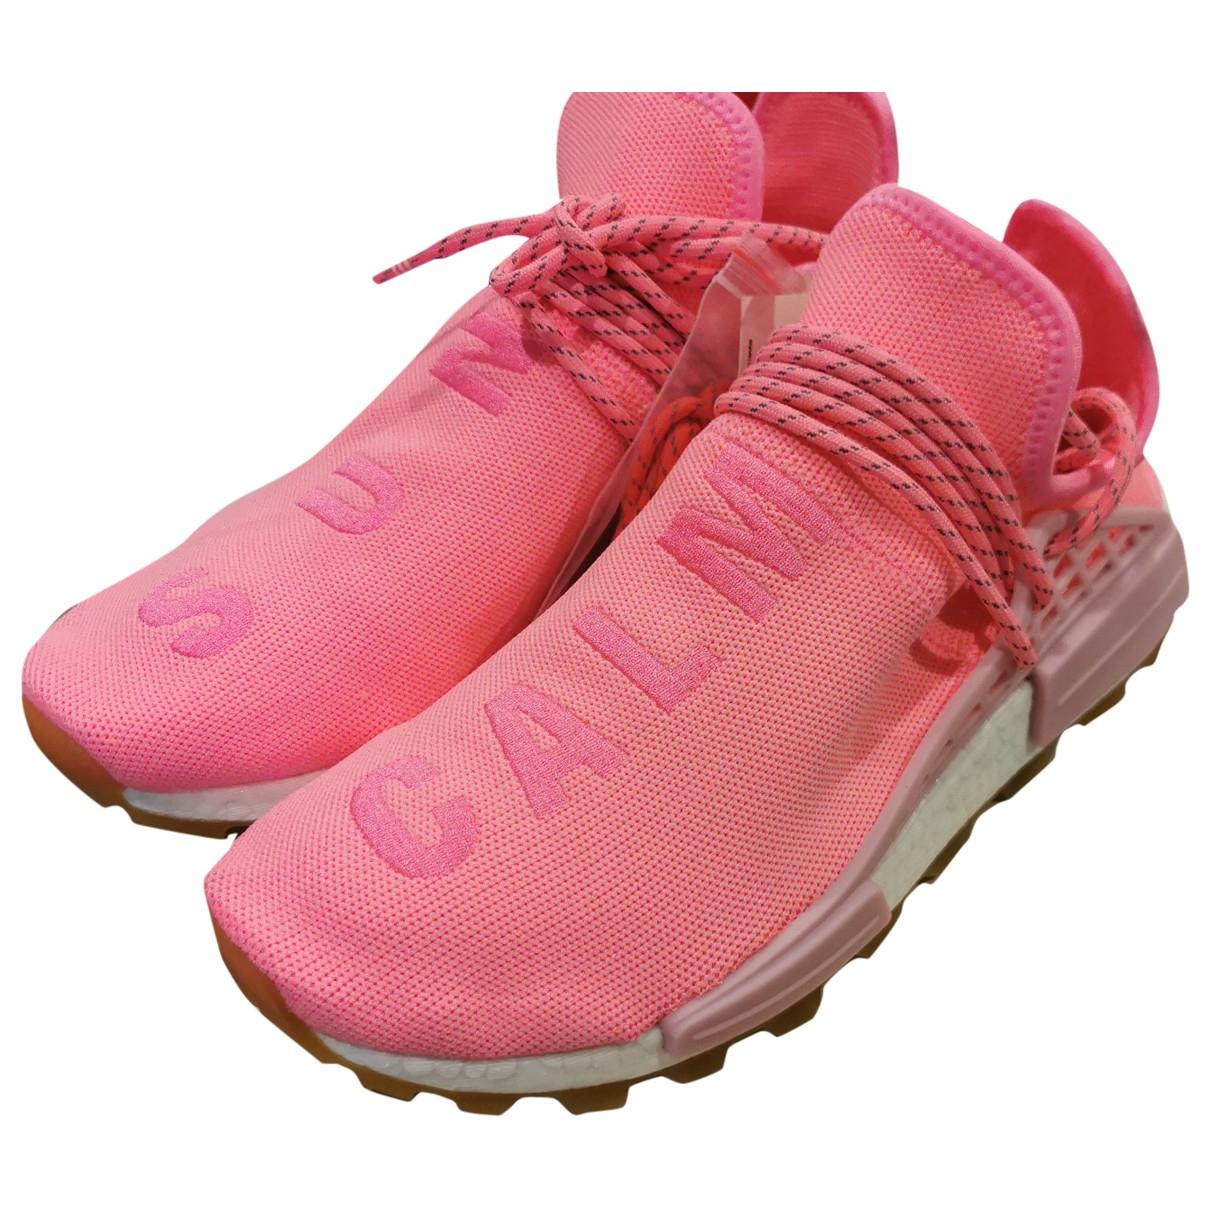 Adidas X Pharrell Williams NMD Hu Sneakers in  Rosa Leinen